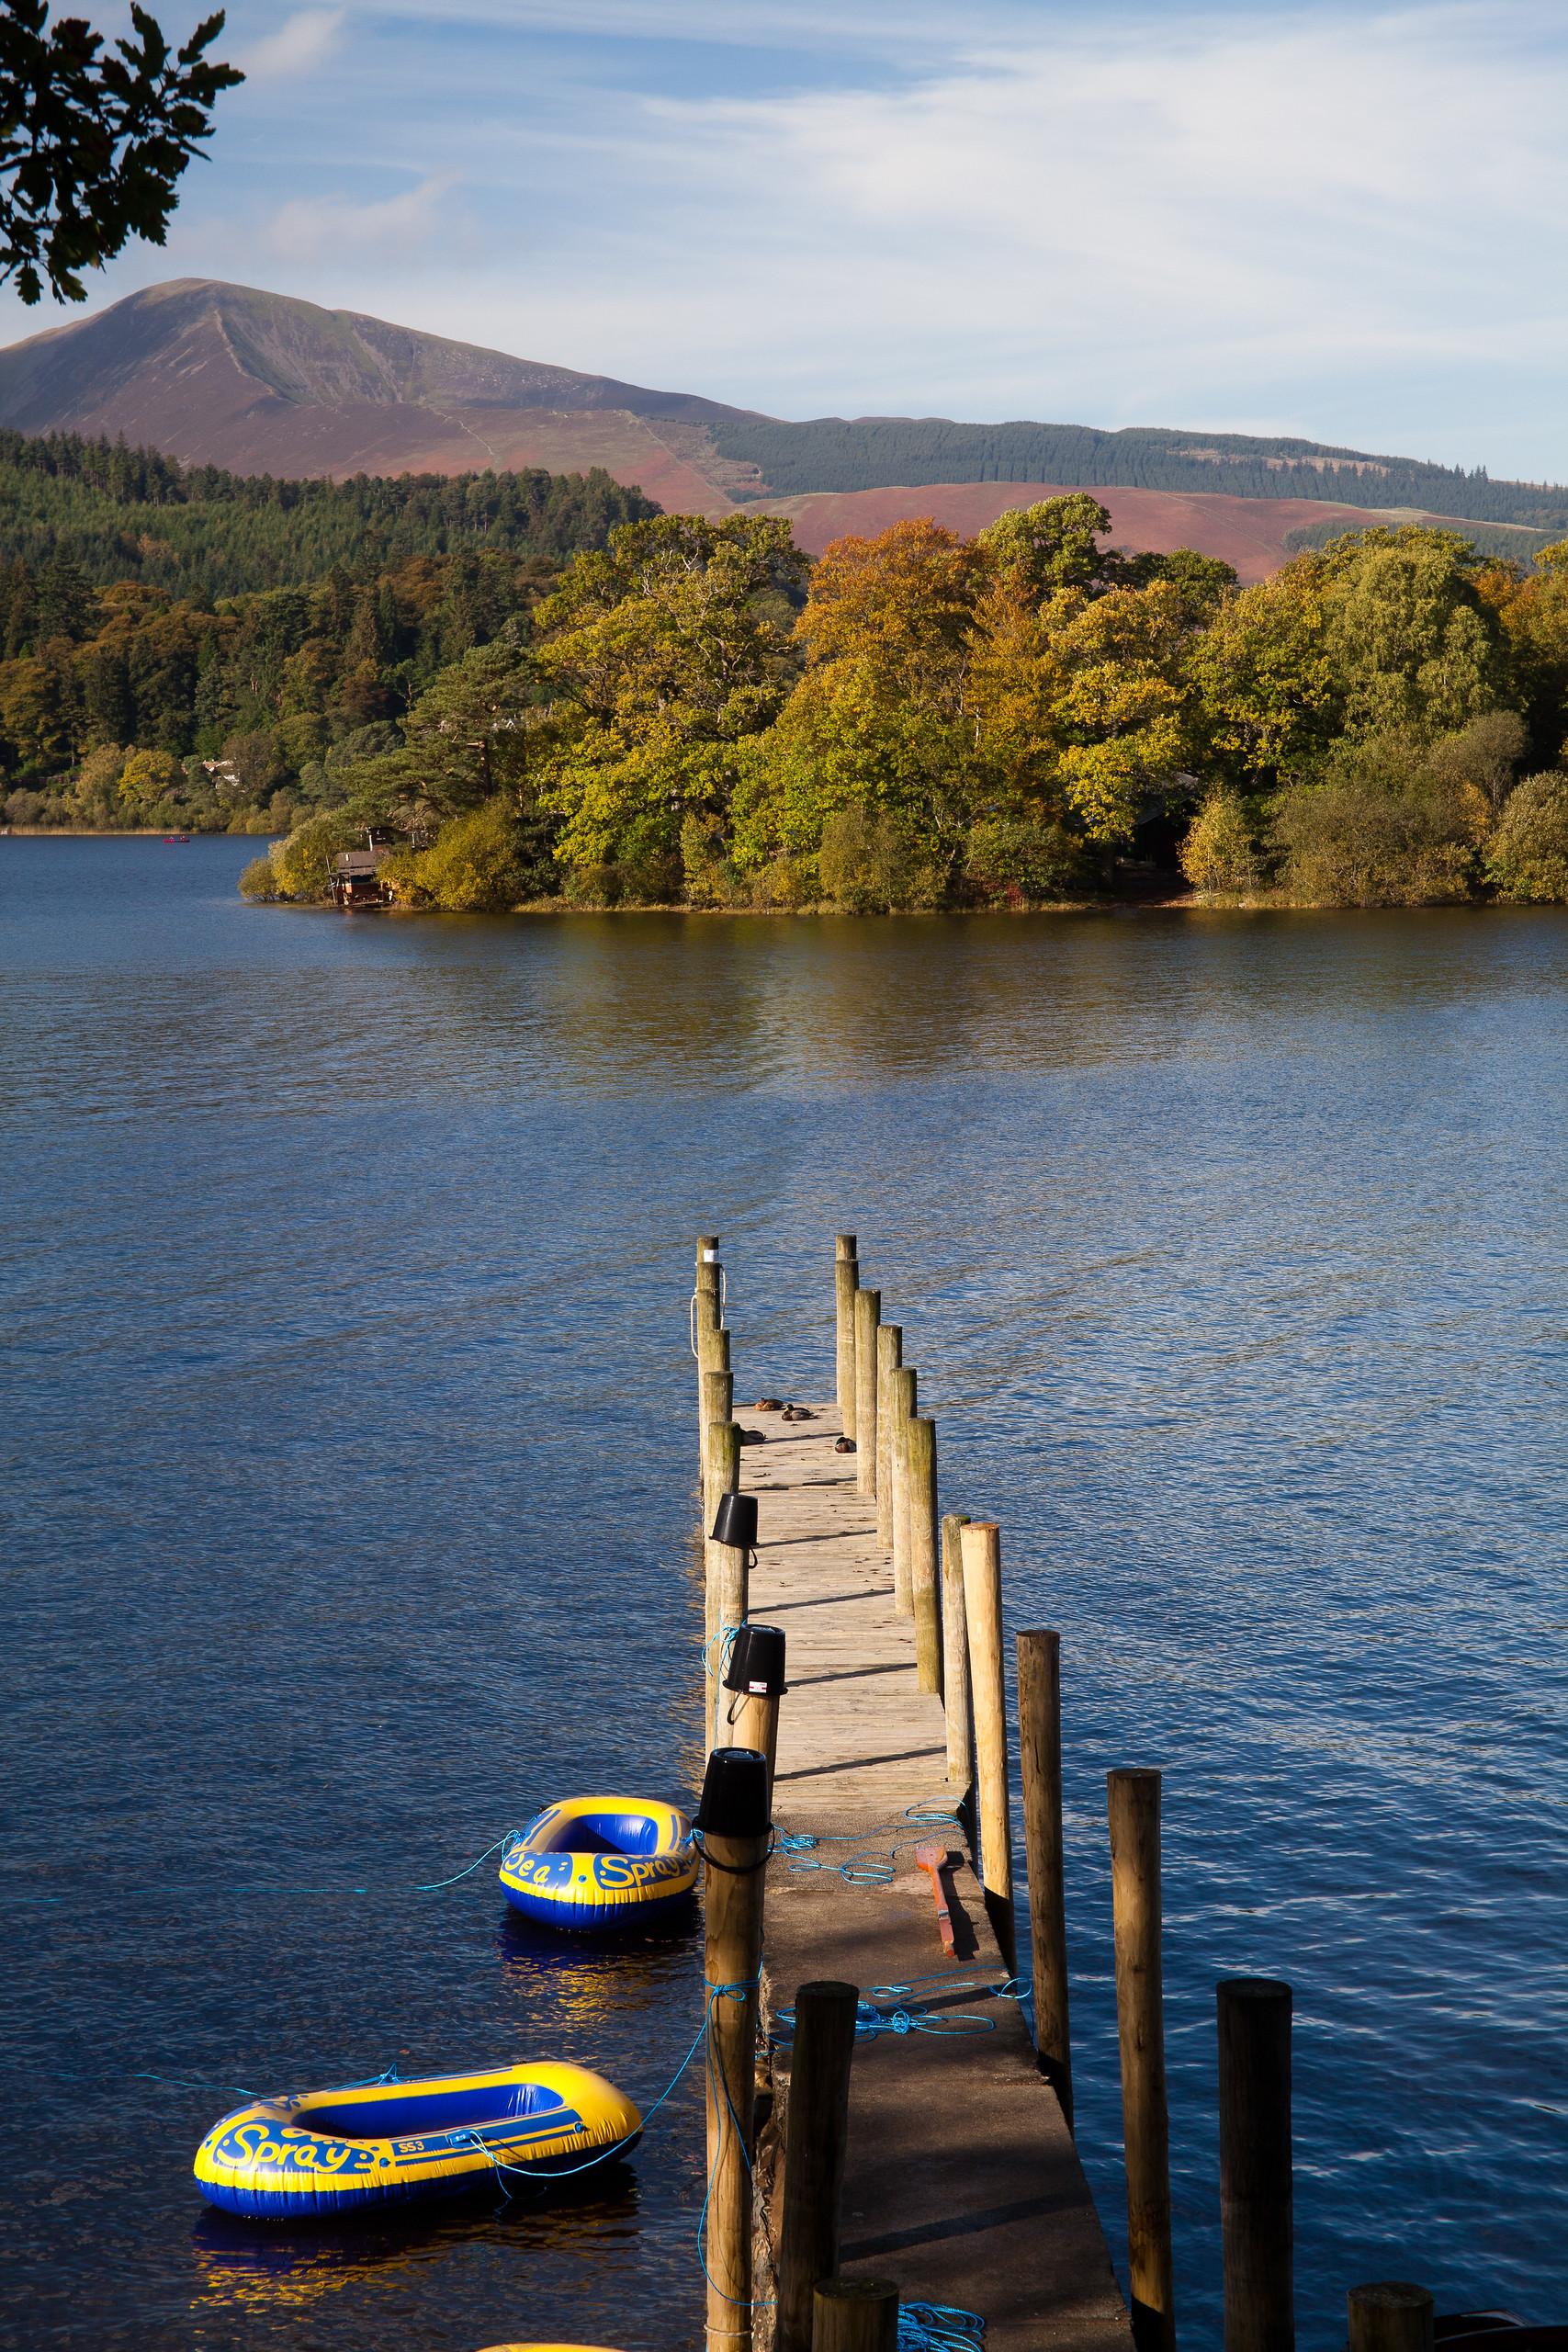 Derwentwater, Keswick, Lake District, England